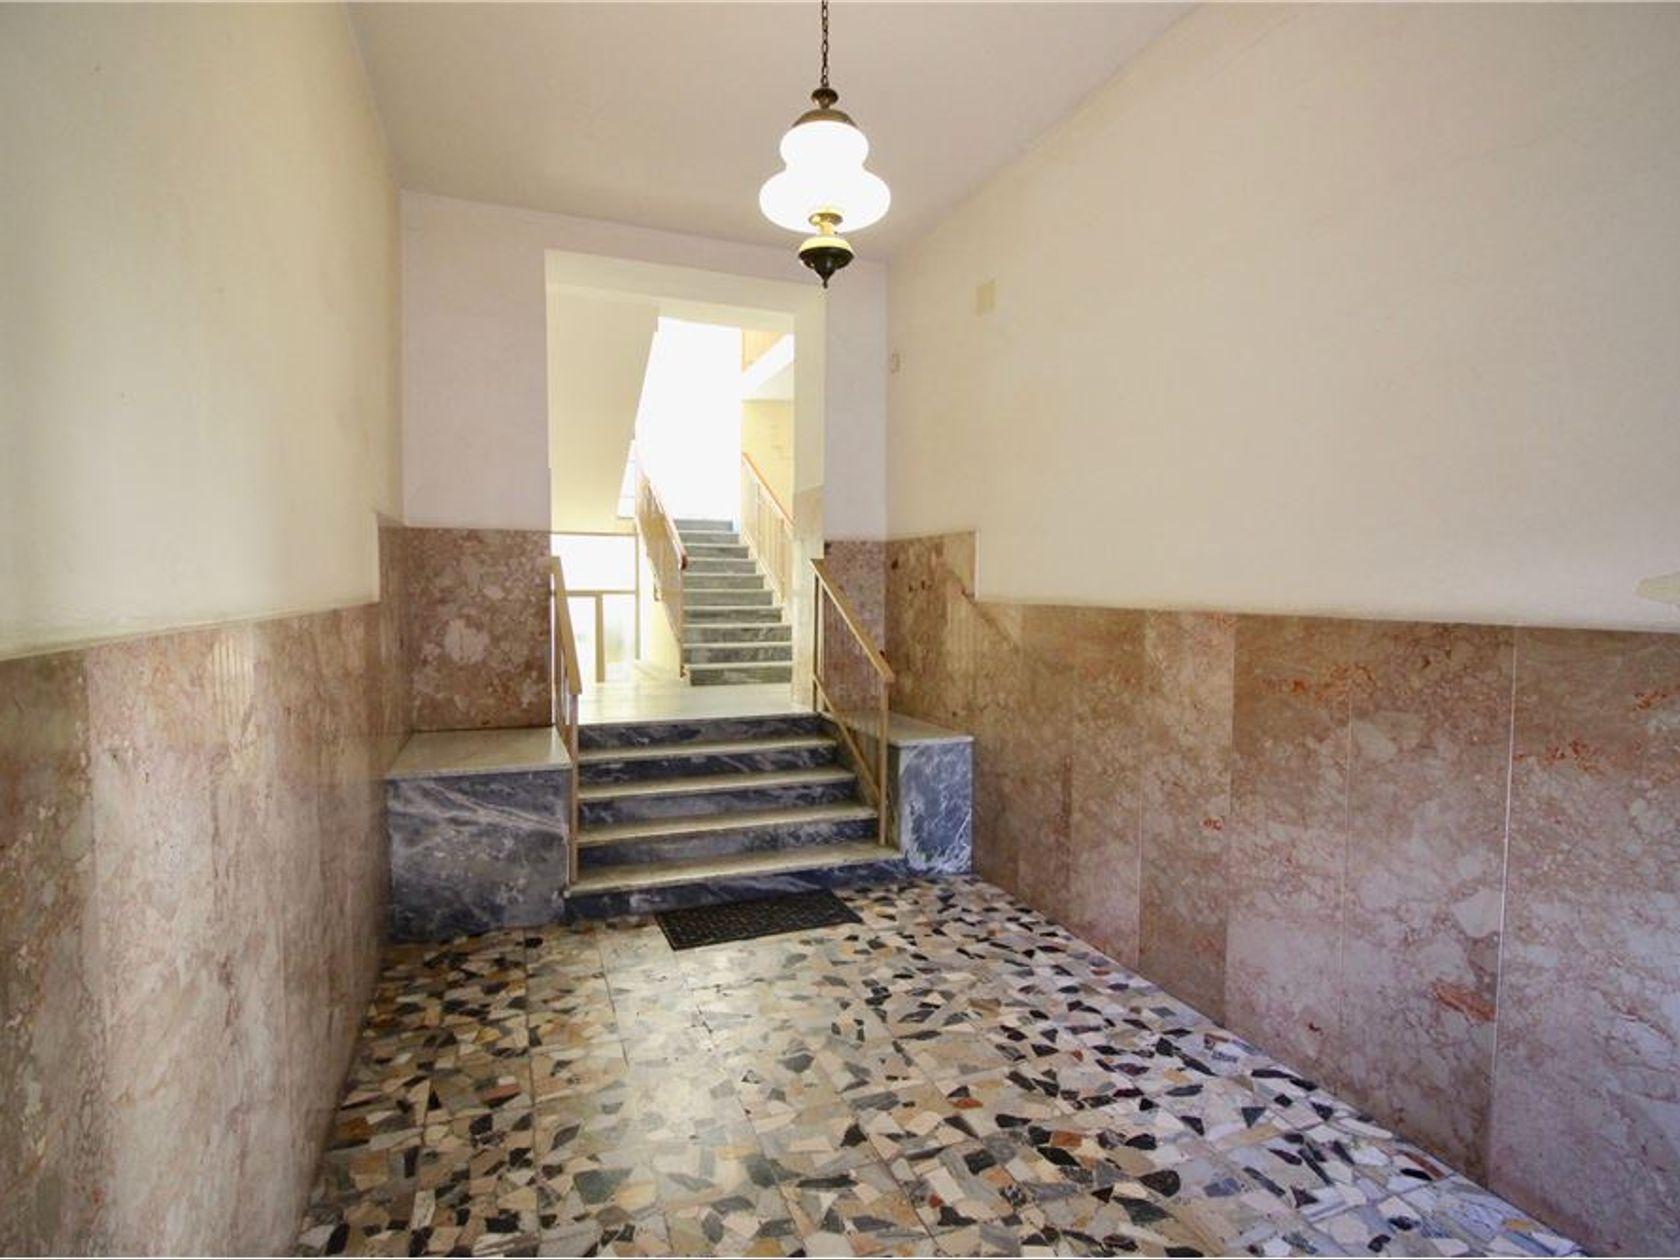 Appartamento Ss-centro, Sassari, SS Vendita - Foto 17